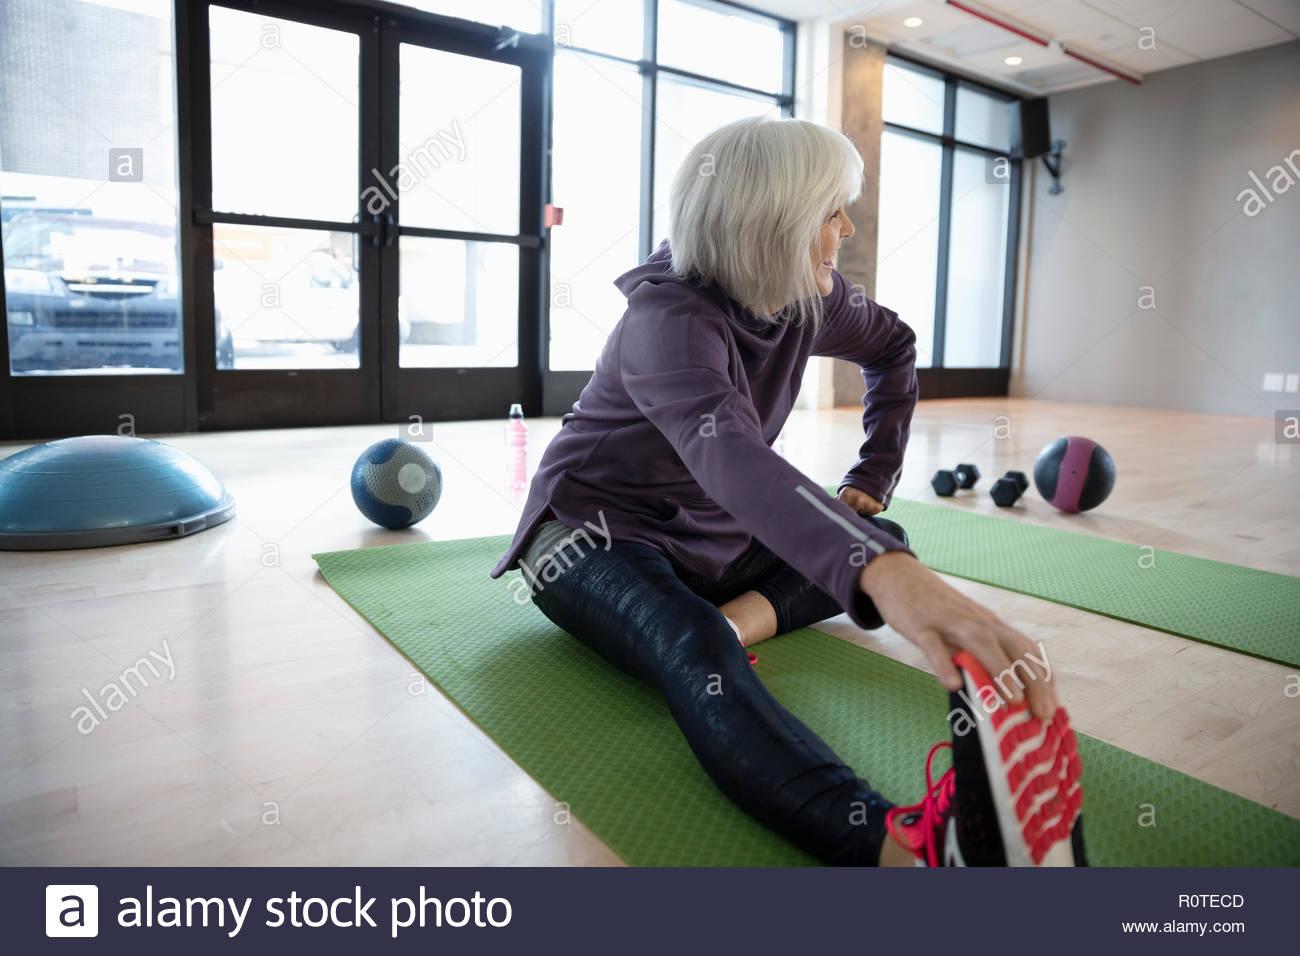 Senior woman stretching leg in studio Photo Stock